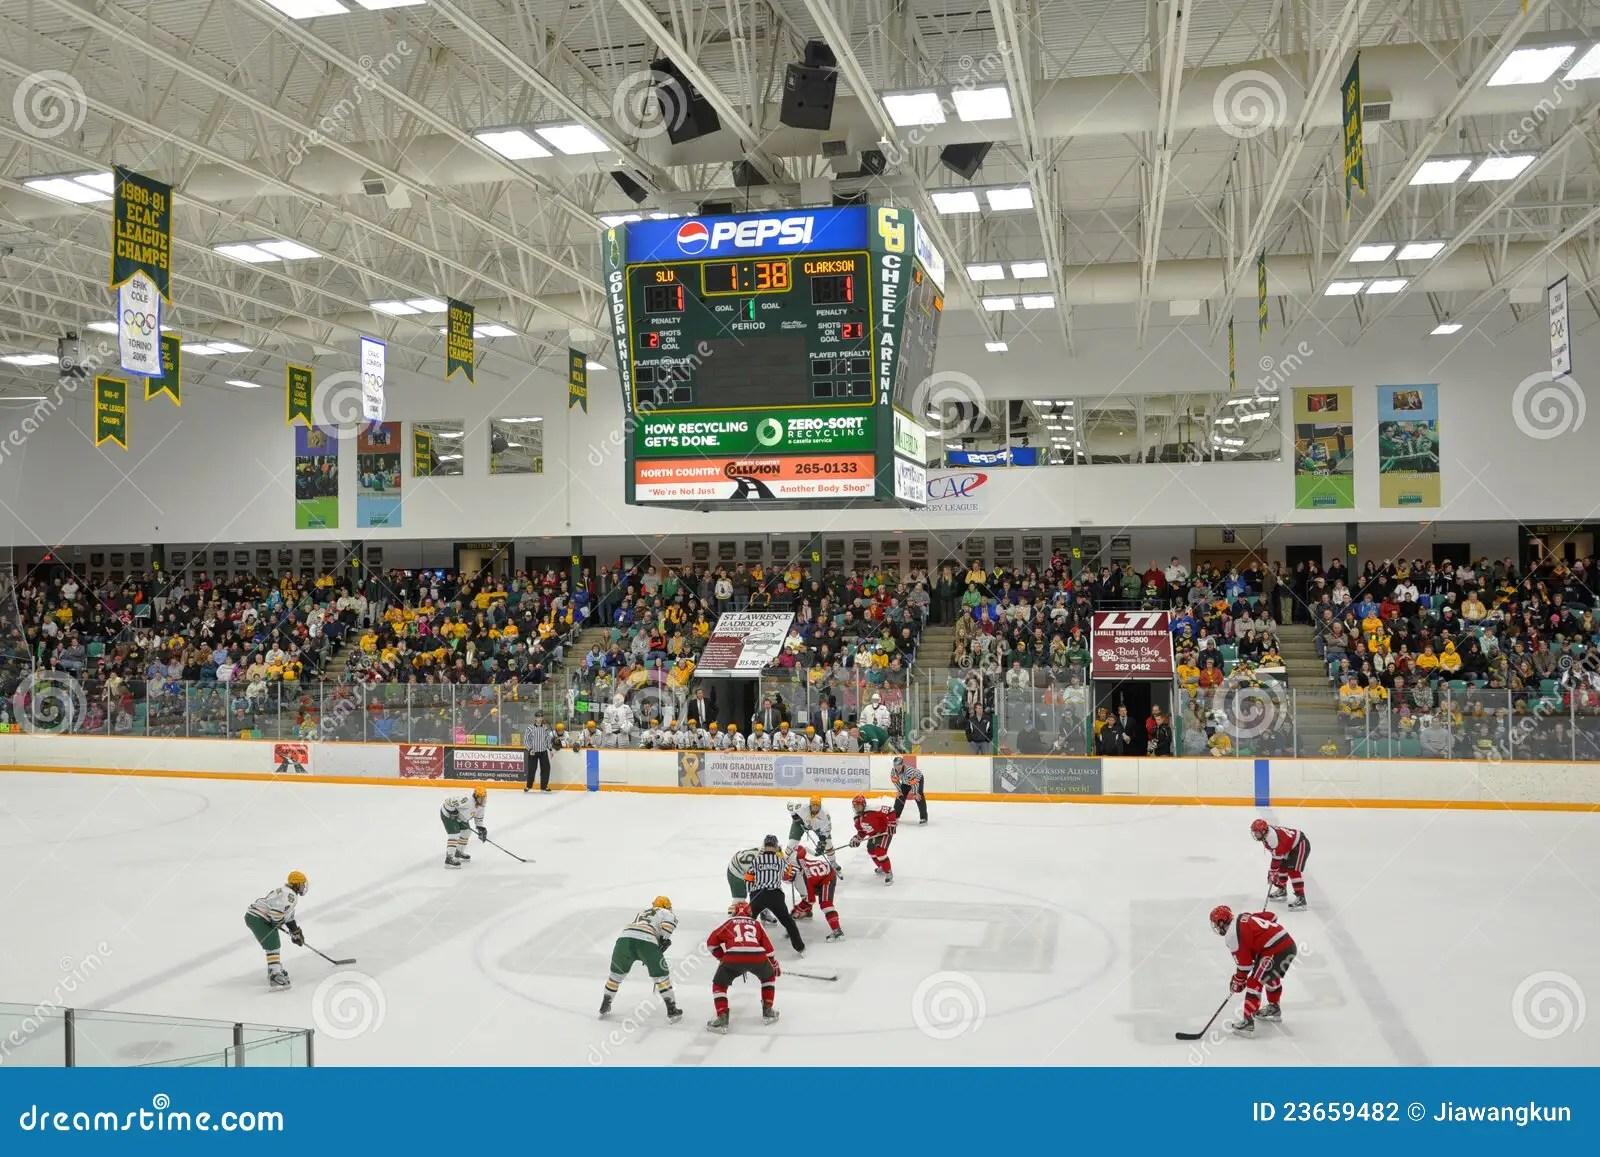 NCAA Ice Hockey Game In Clarkson University Editorial